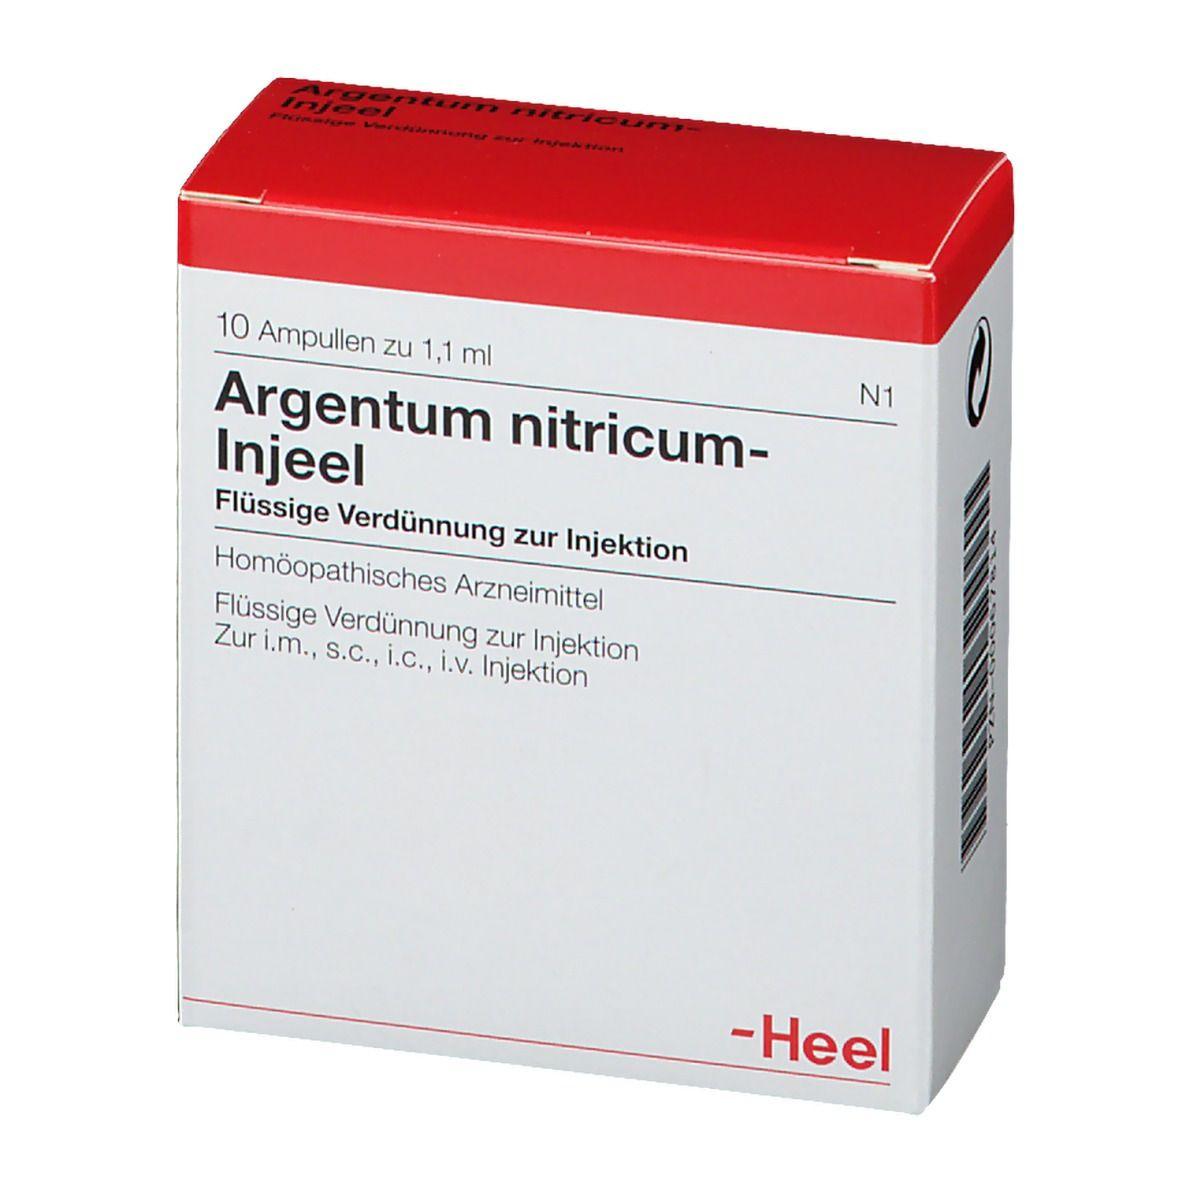 Argentum nitricum-Injeel® Ampullen